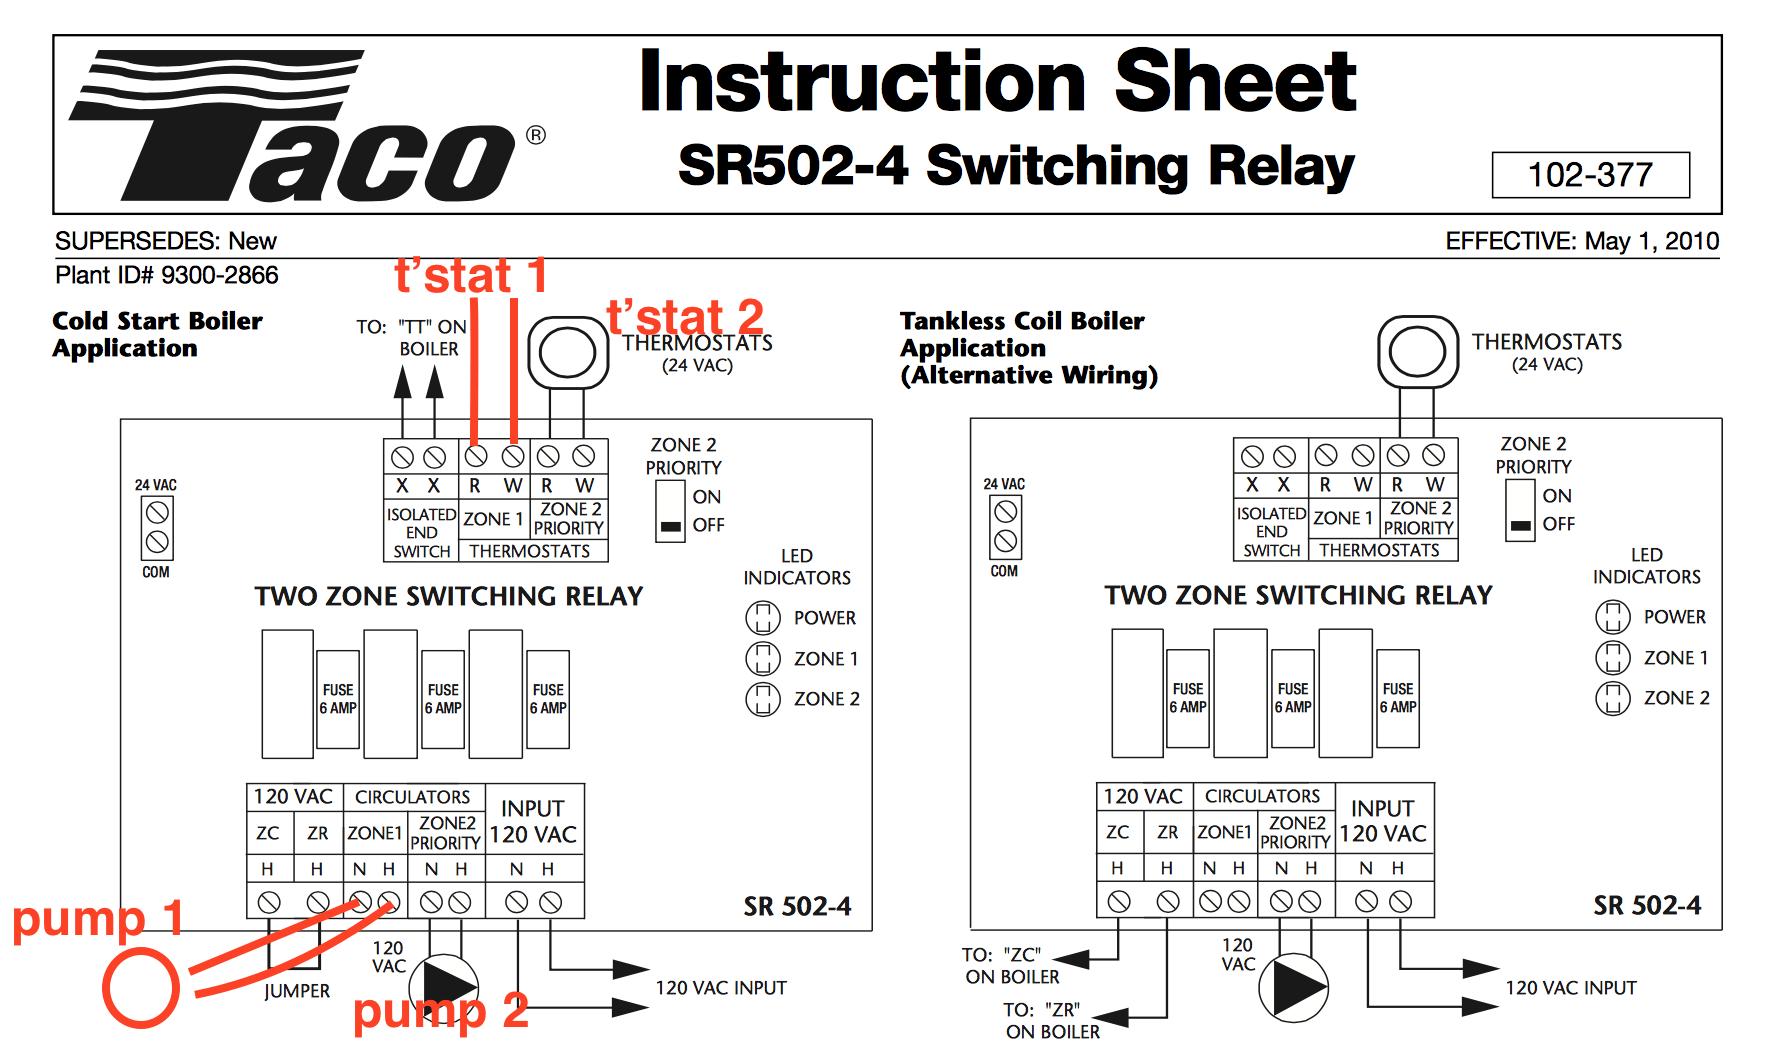 honeywell aquastat l4006a wiring diagram s plan plus circulator pump relay r845a  heating